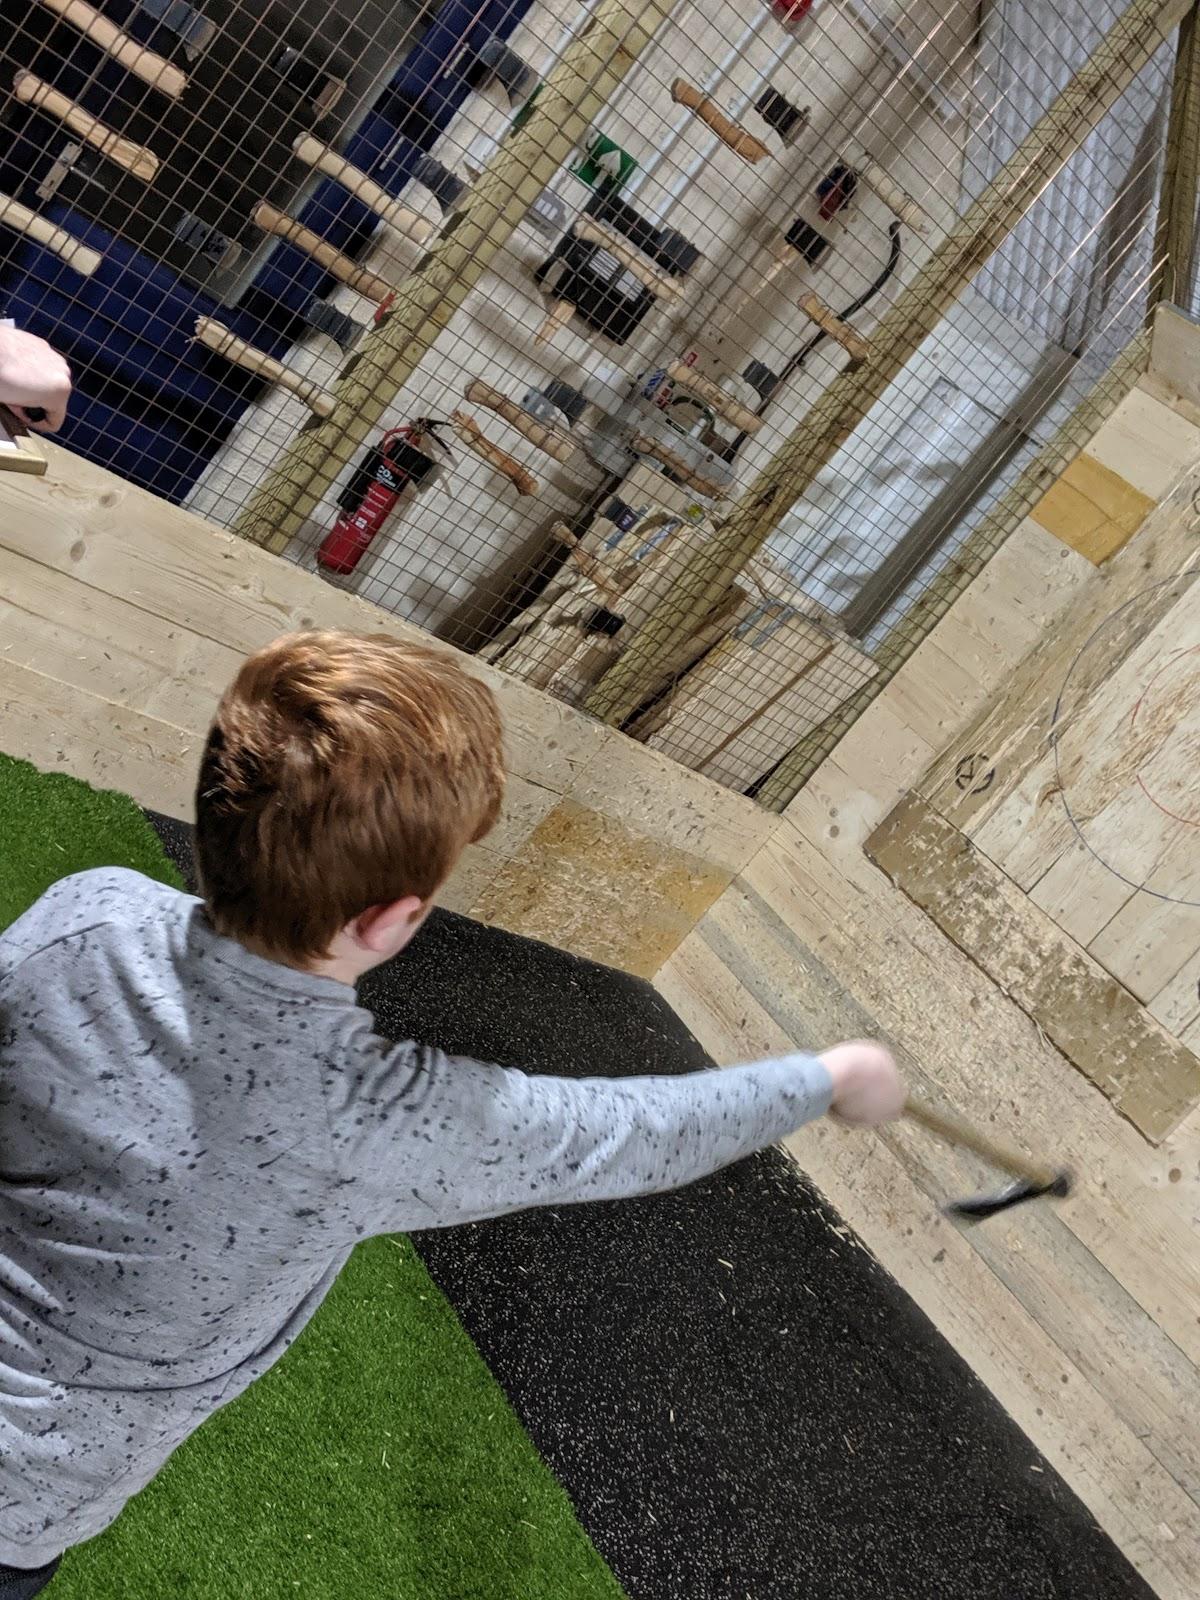 Indoor Axe Throwing in Newcastle at Hatchet Harry's  (Review) - kids throwing